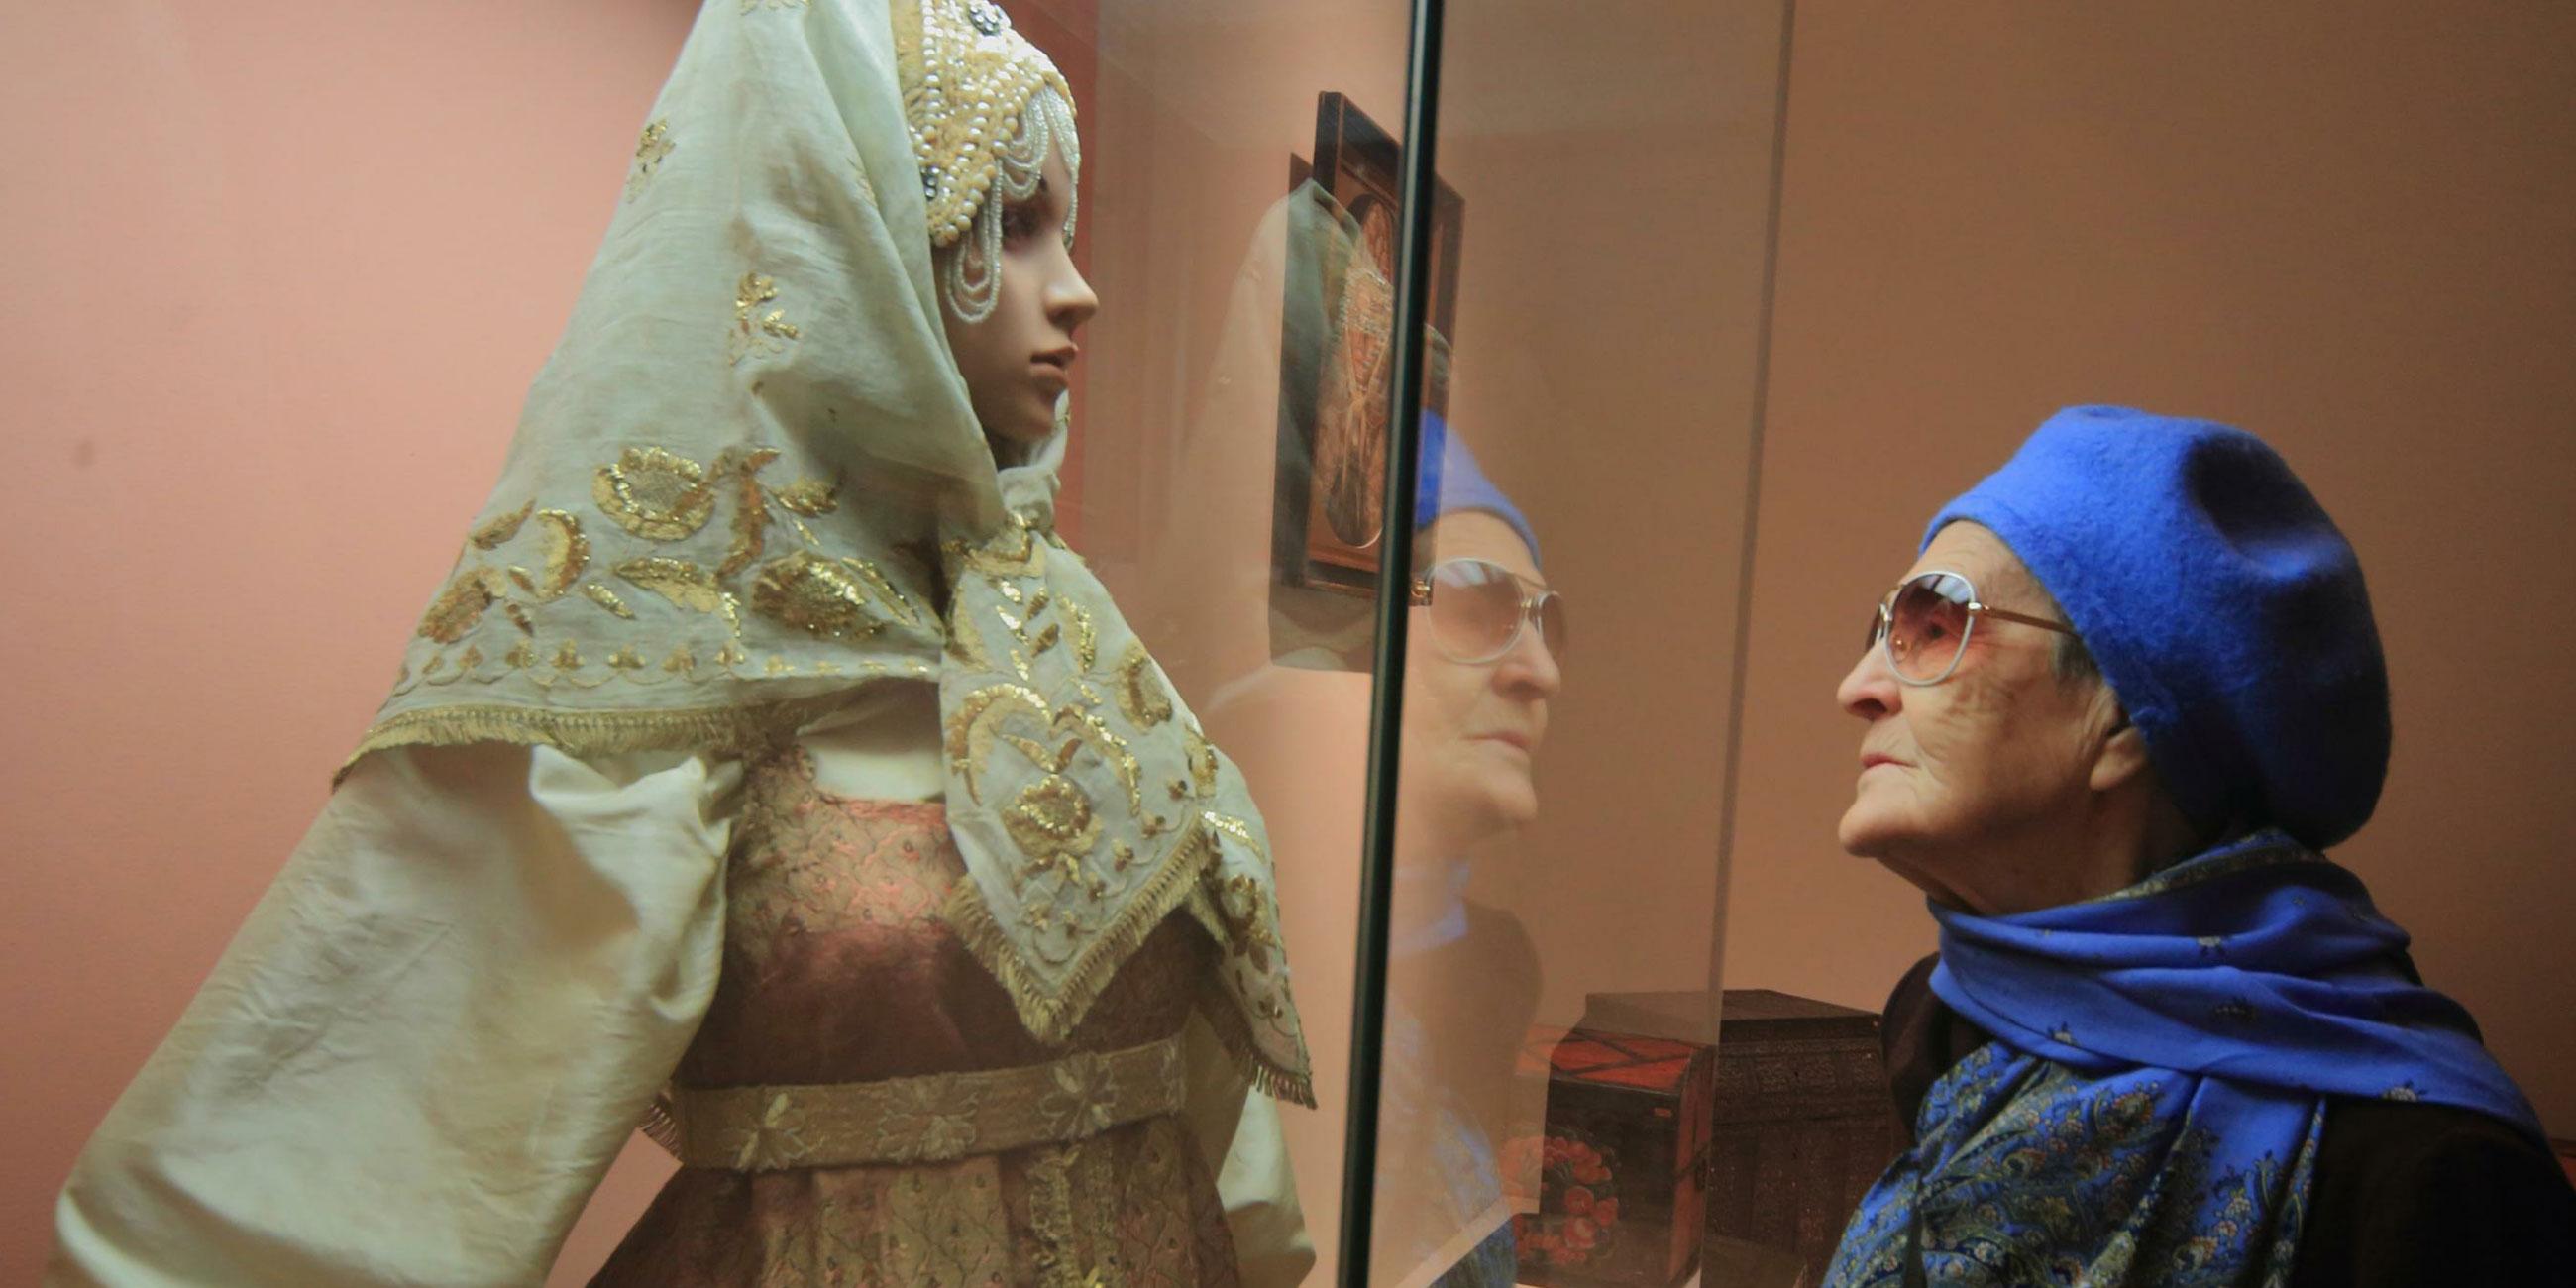 В 2014 в корпусе Бенуа прошла выставка русского костюмаФото: globalllokpress.com